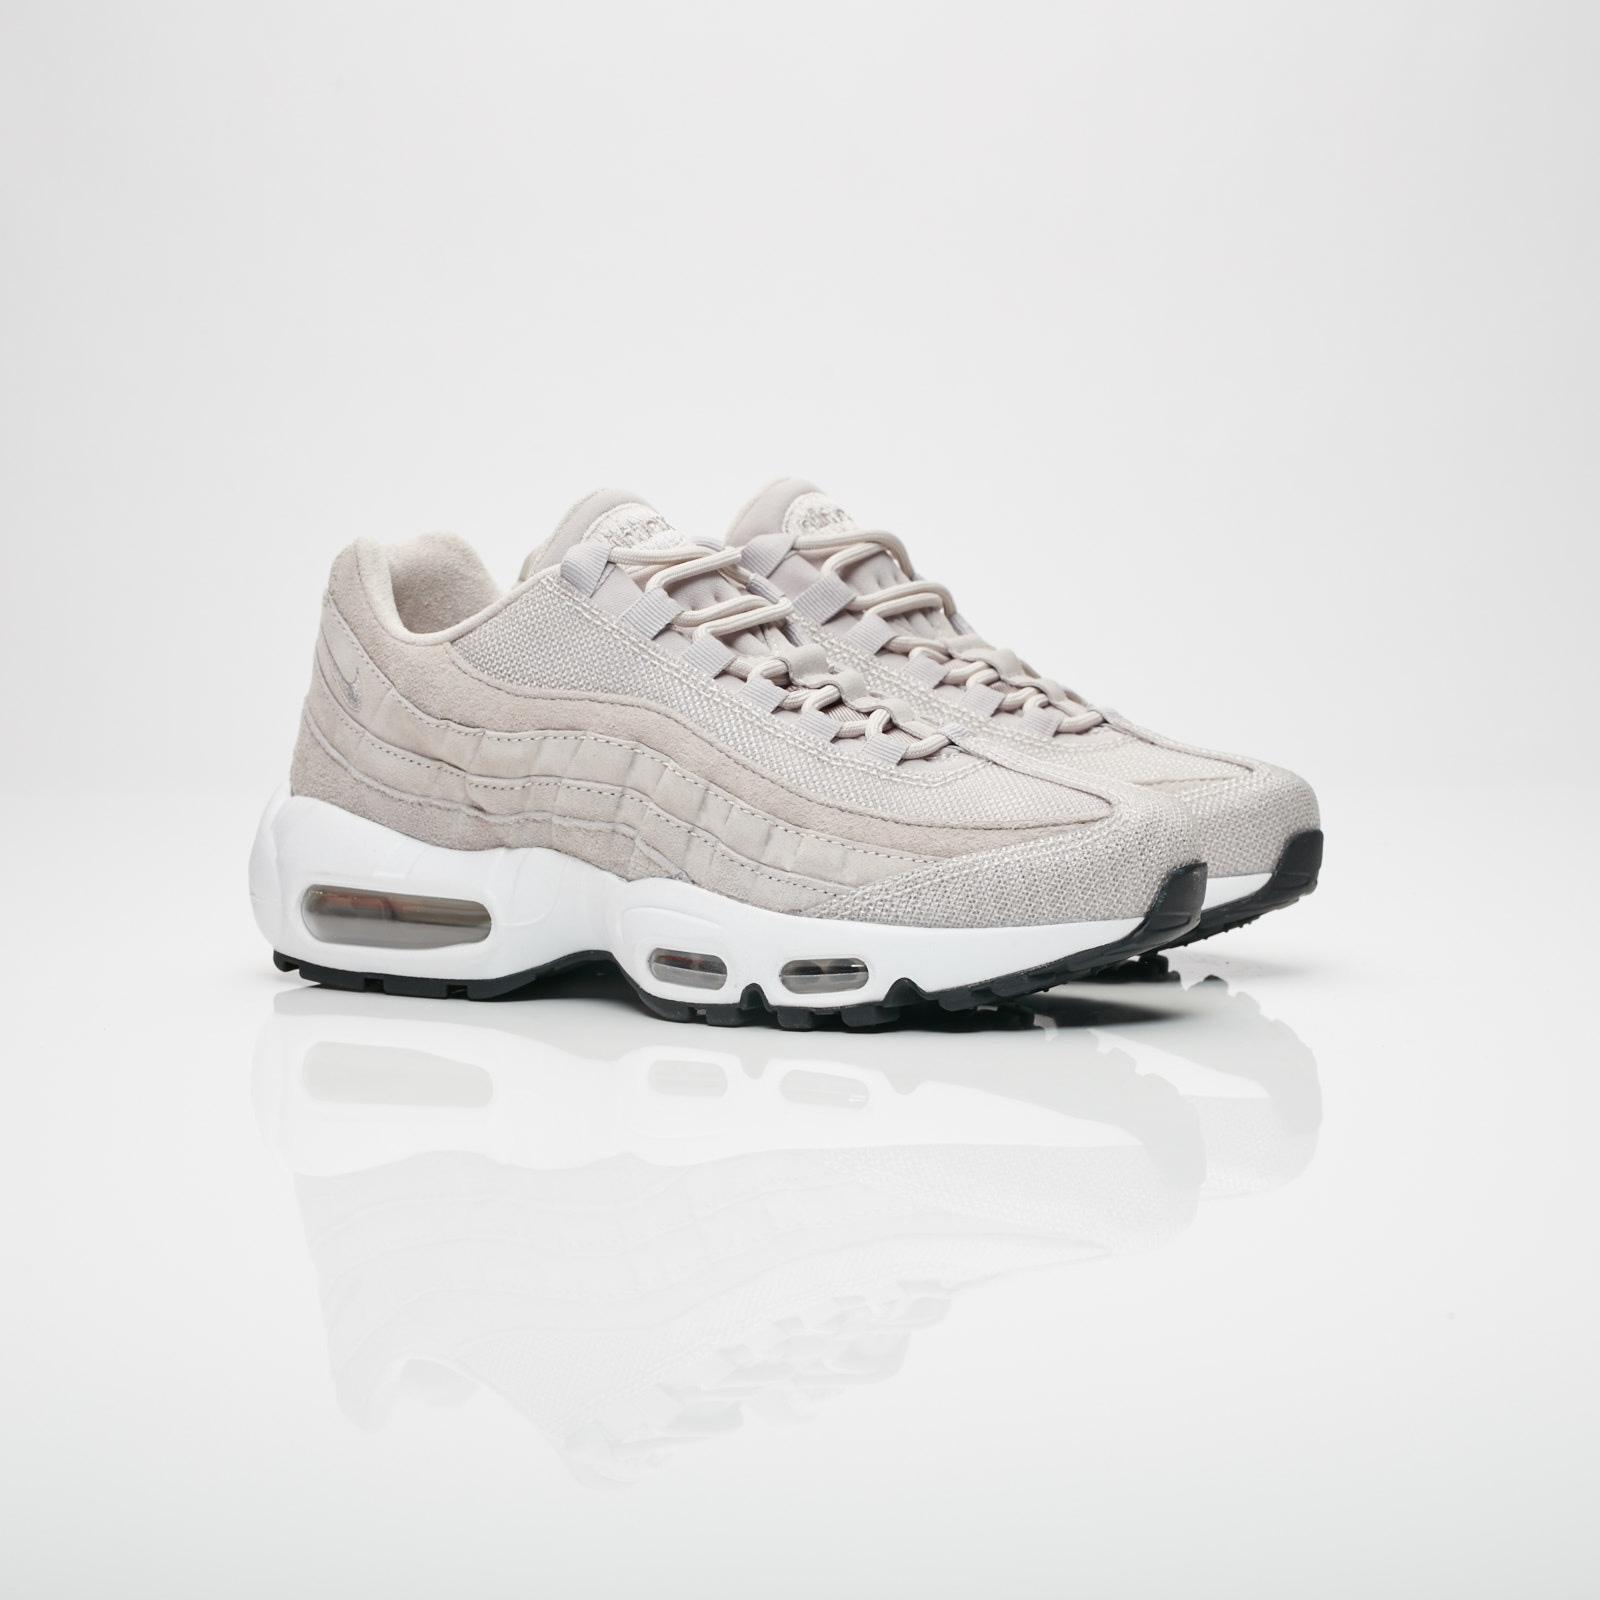 huge discount 45bf5 2aa56 Nike Sportswear Wmns Air Max 95 PRM